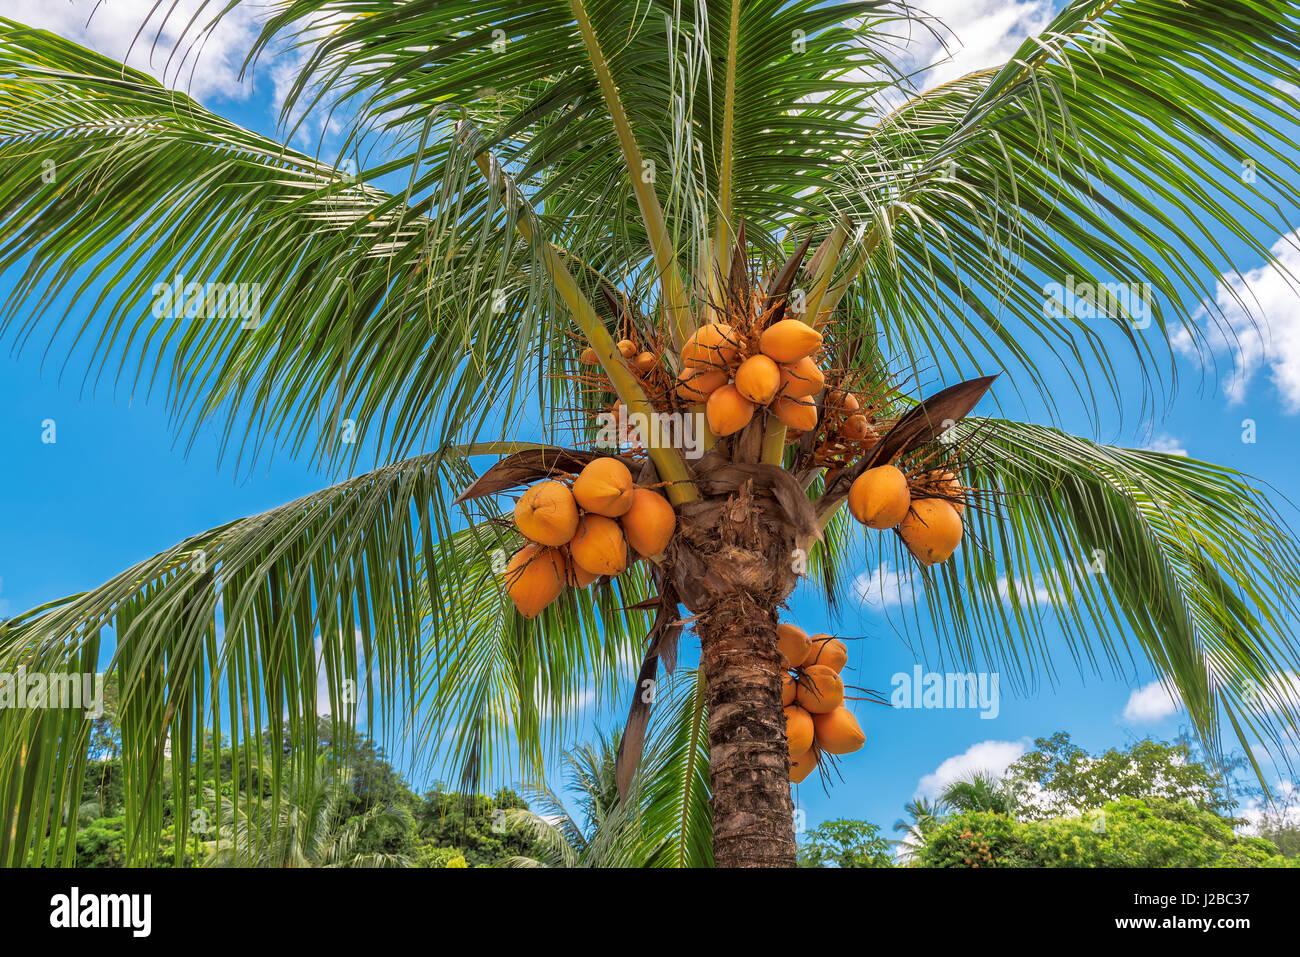 Noix de coco Orange on palm tree Photo Stock